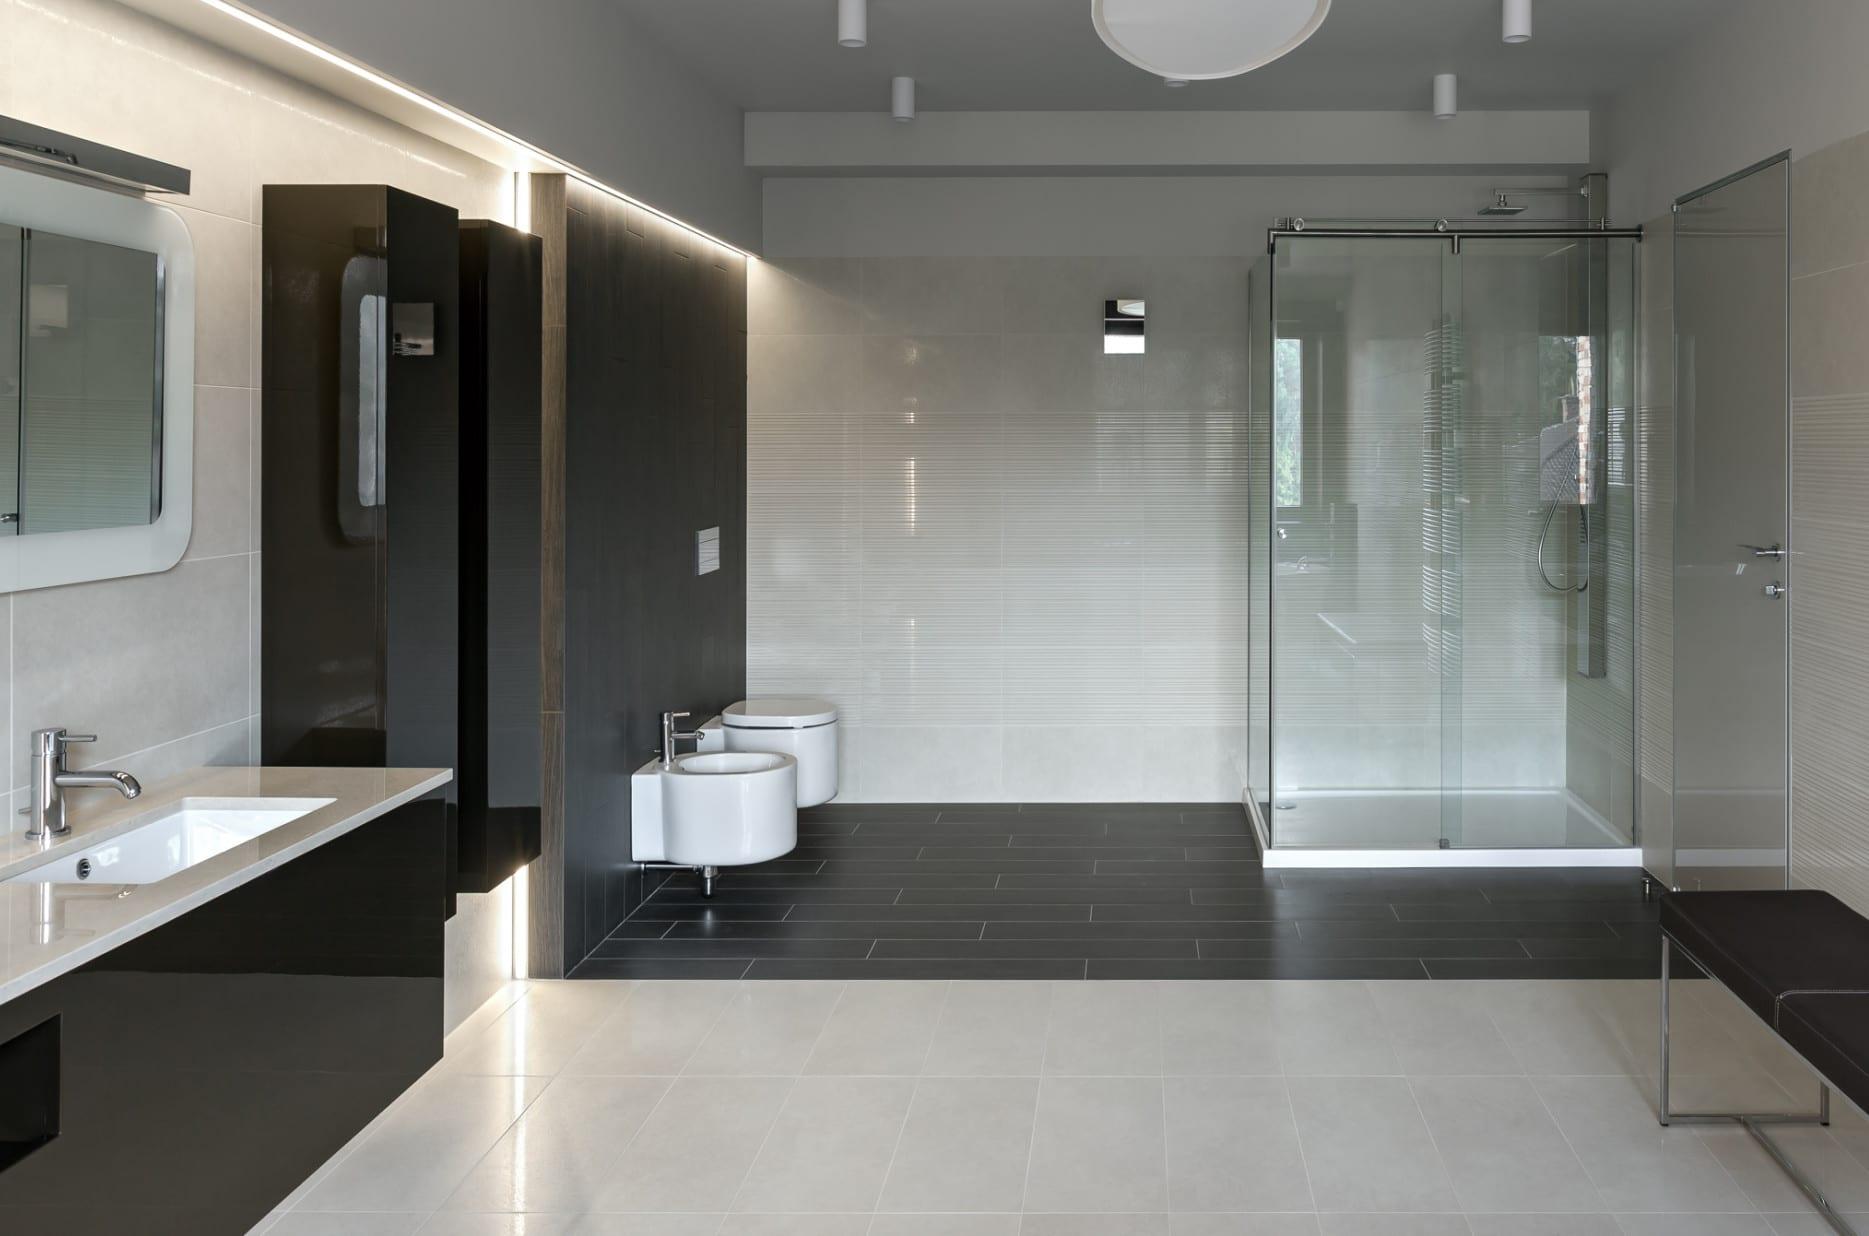 3d Foto Fußboden ~ Badezimmer fußboden d nasser fußboden im badezimmer